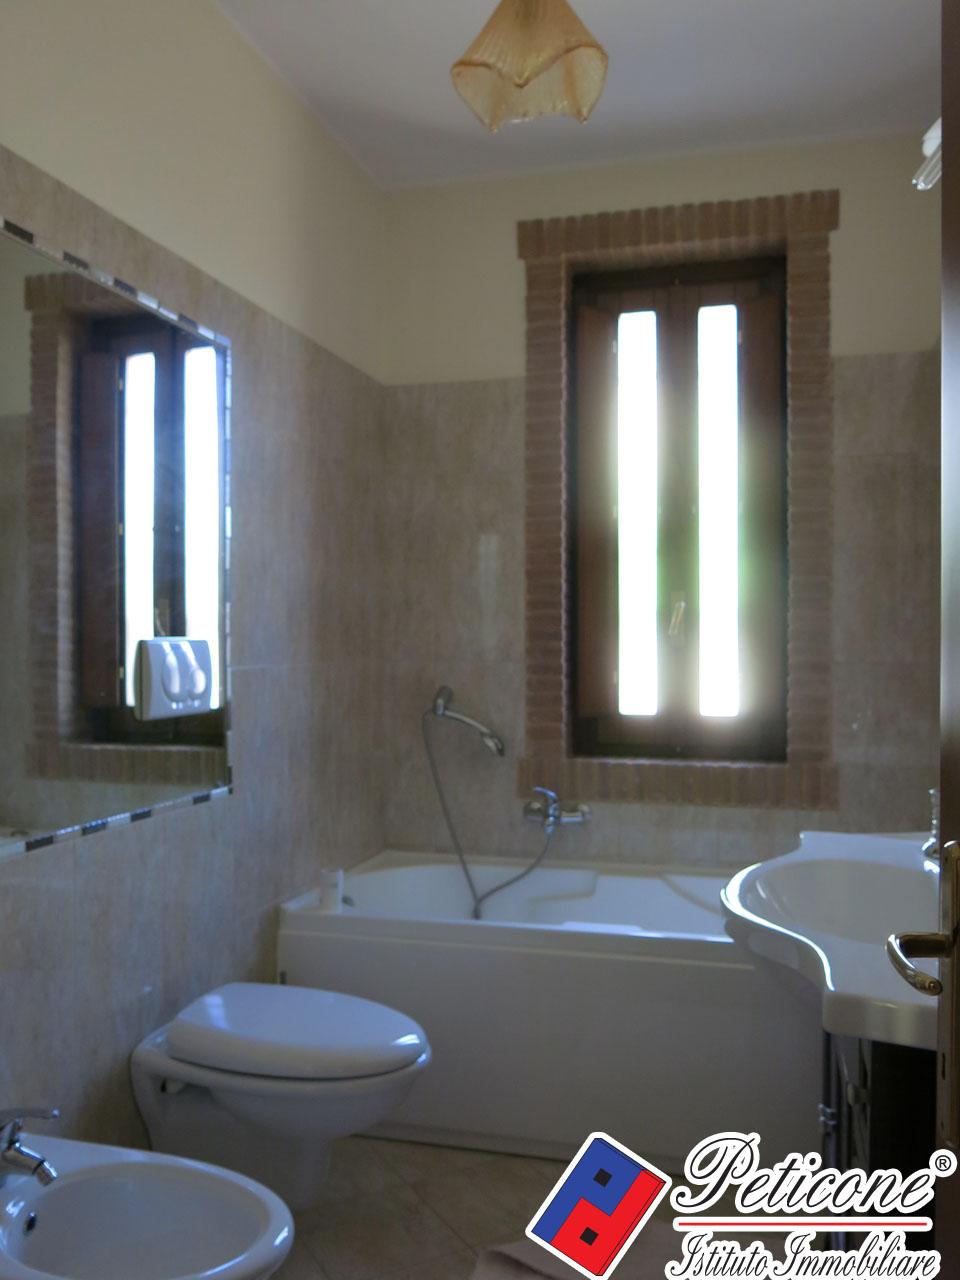 Villa in Vendita a Fondi: 3 locali, 107 mq - Foto 12